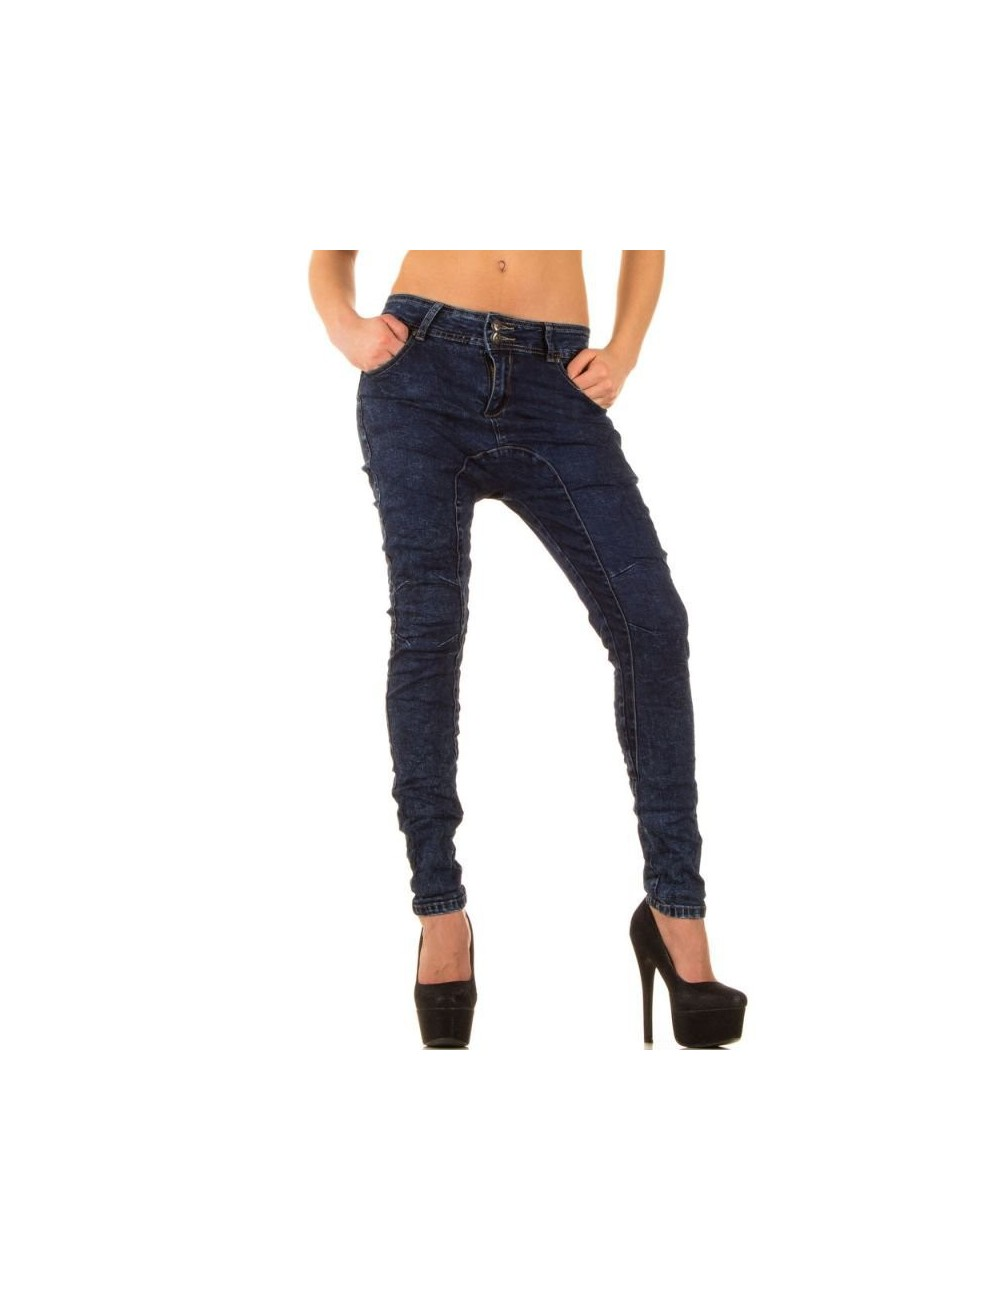 DK Jeans Denim